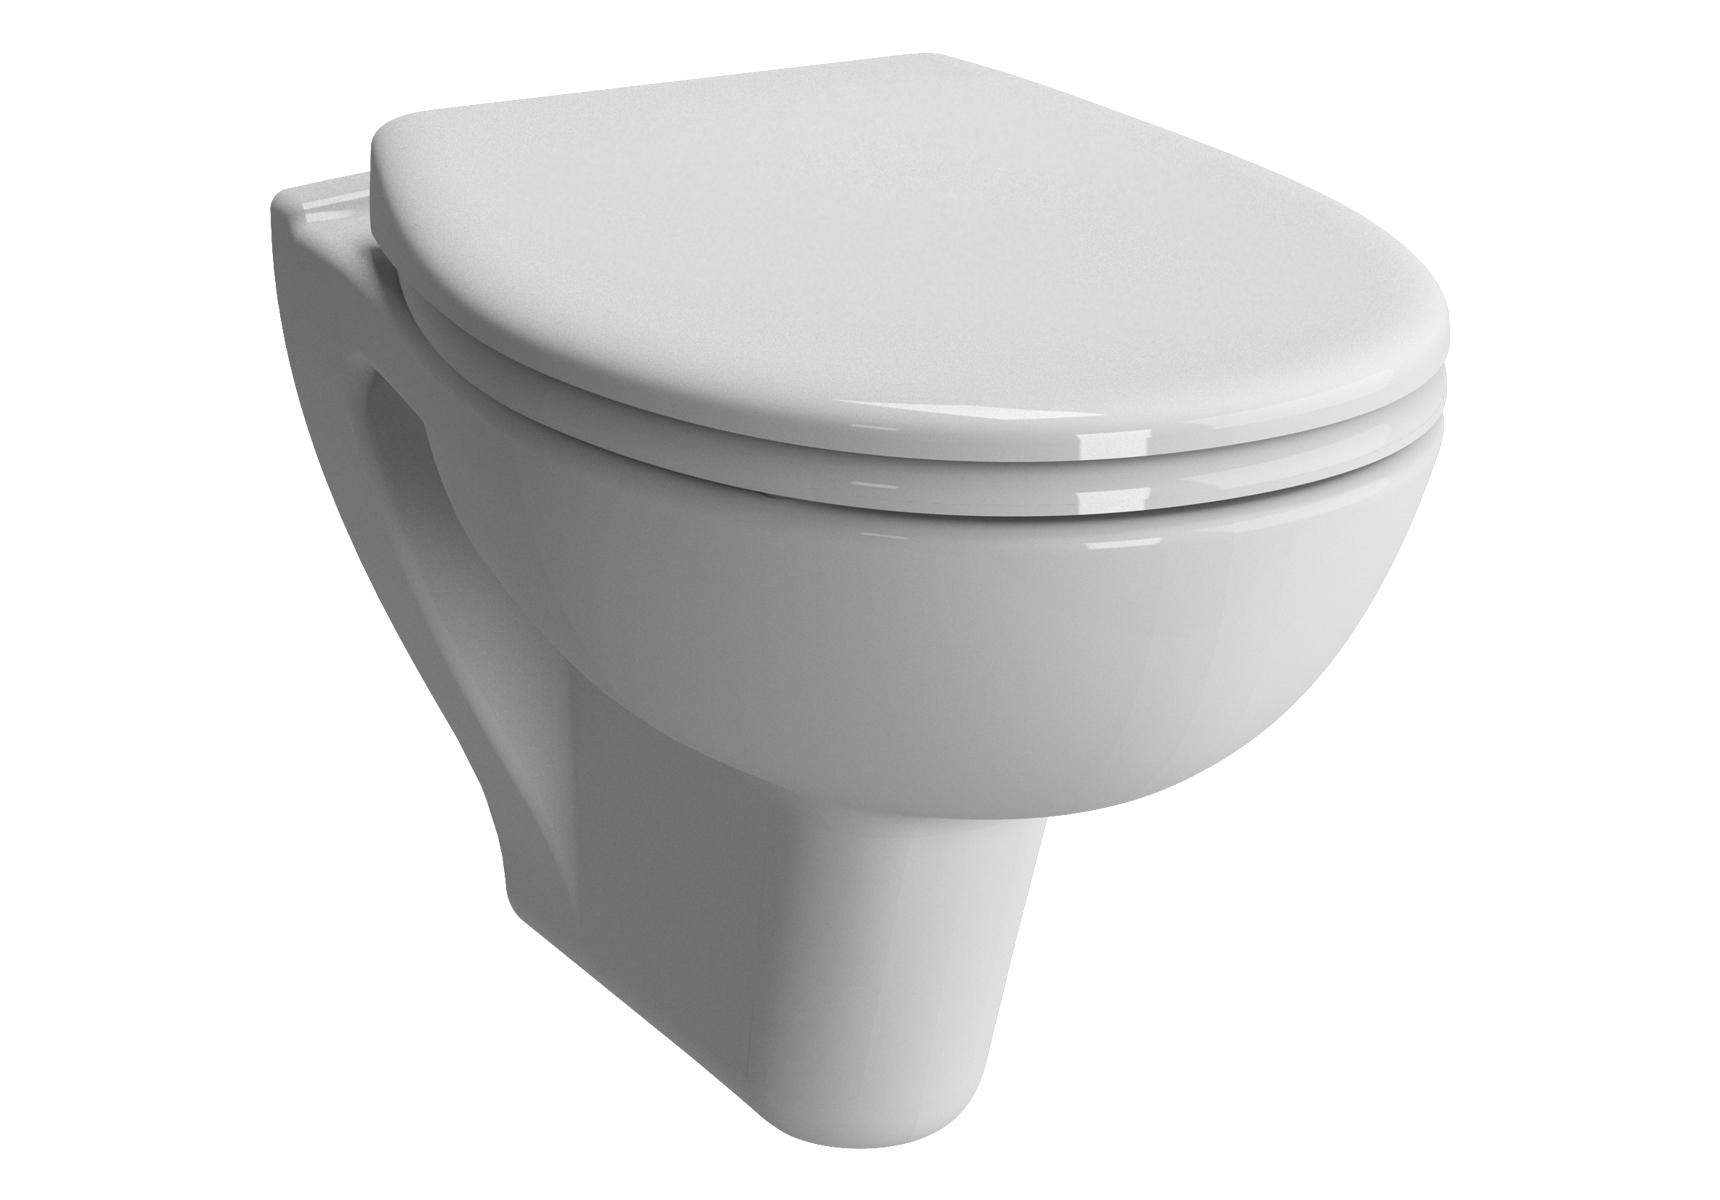 S20 Wand-WC VitrA Flush 2.0 mit Bidetfunktion